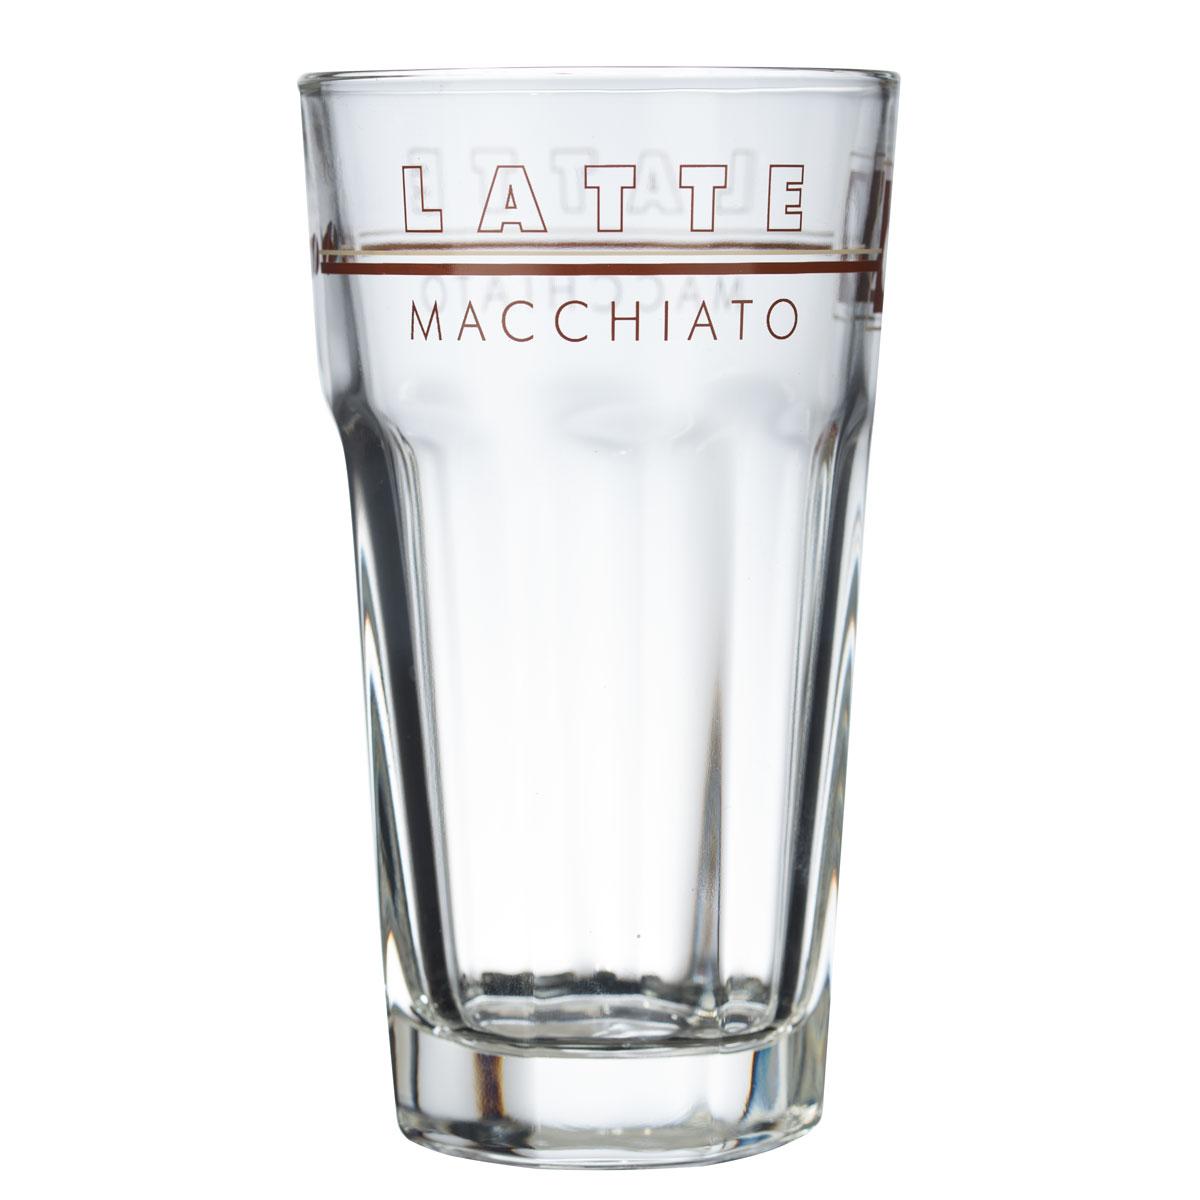 latte macchiato glas rastal 340 ml macchiato gl ser. Black Bedroom Furniture Sets. Home Design Ideas